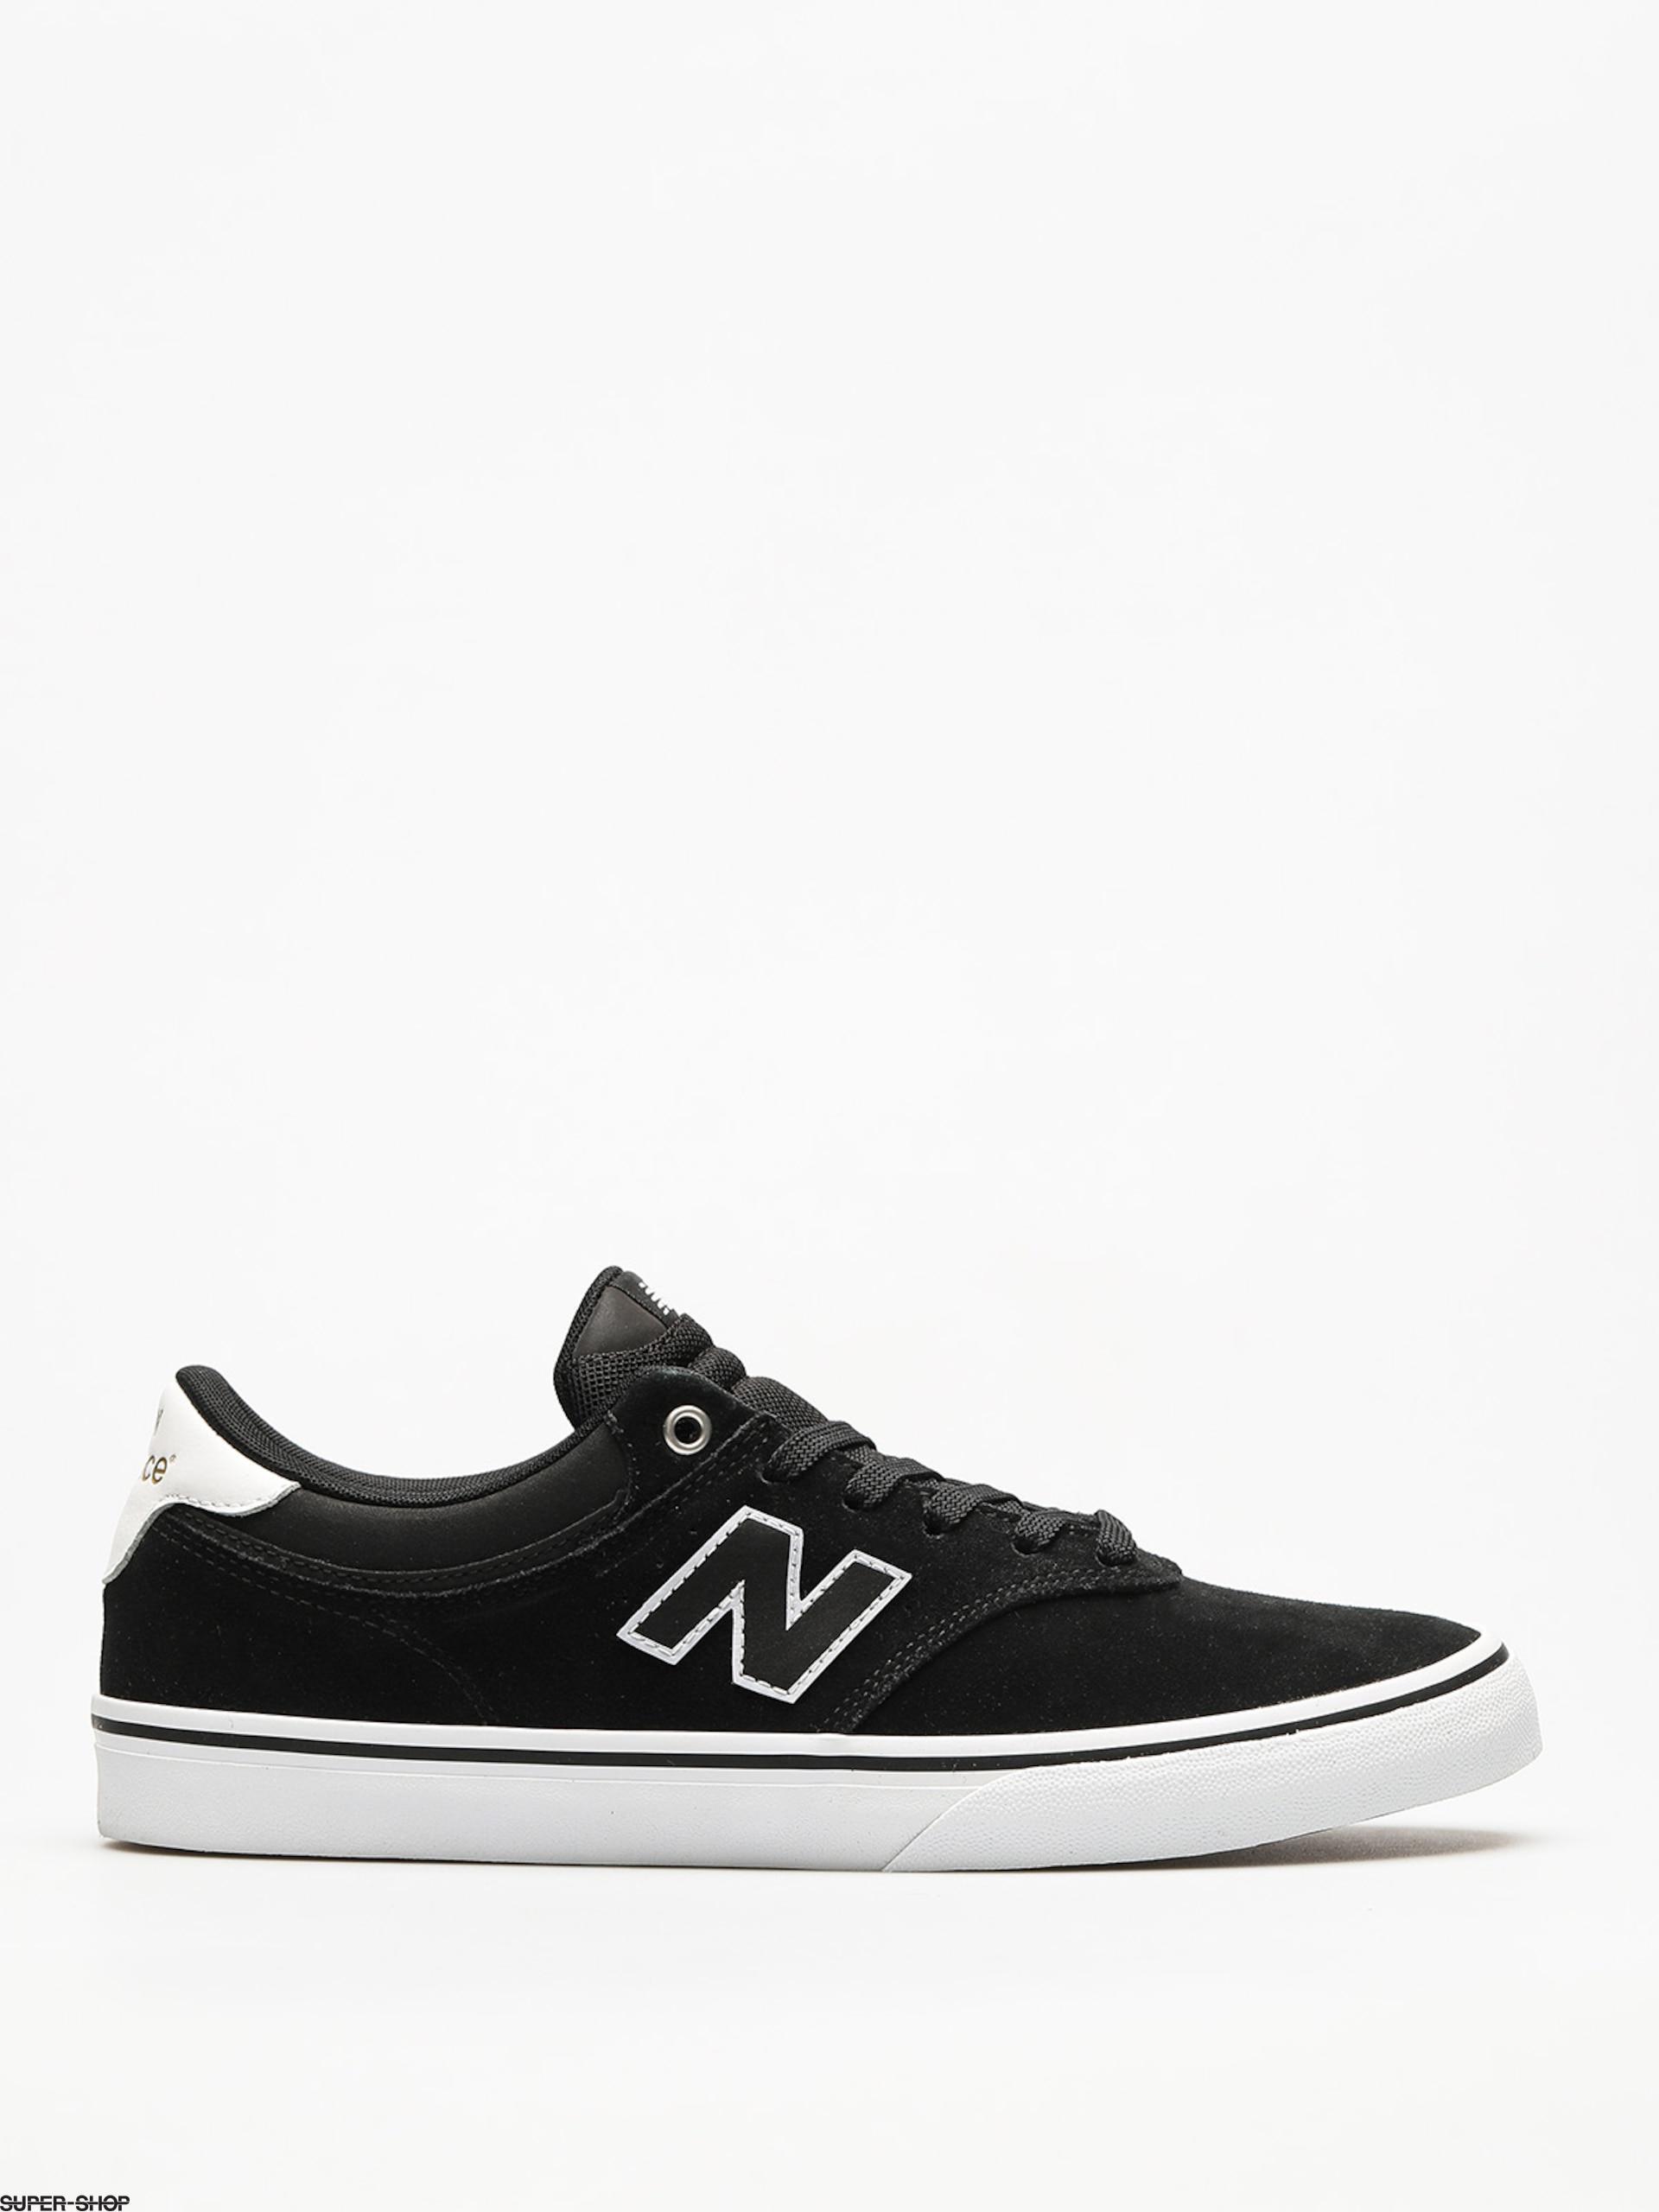 reputable site 2a030 9dd07 New Balance Schuhe 255 (black/white)